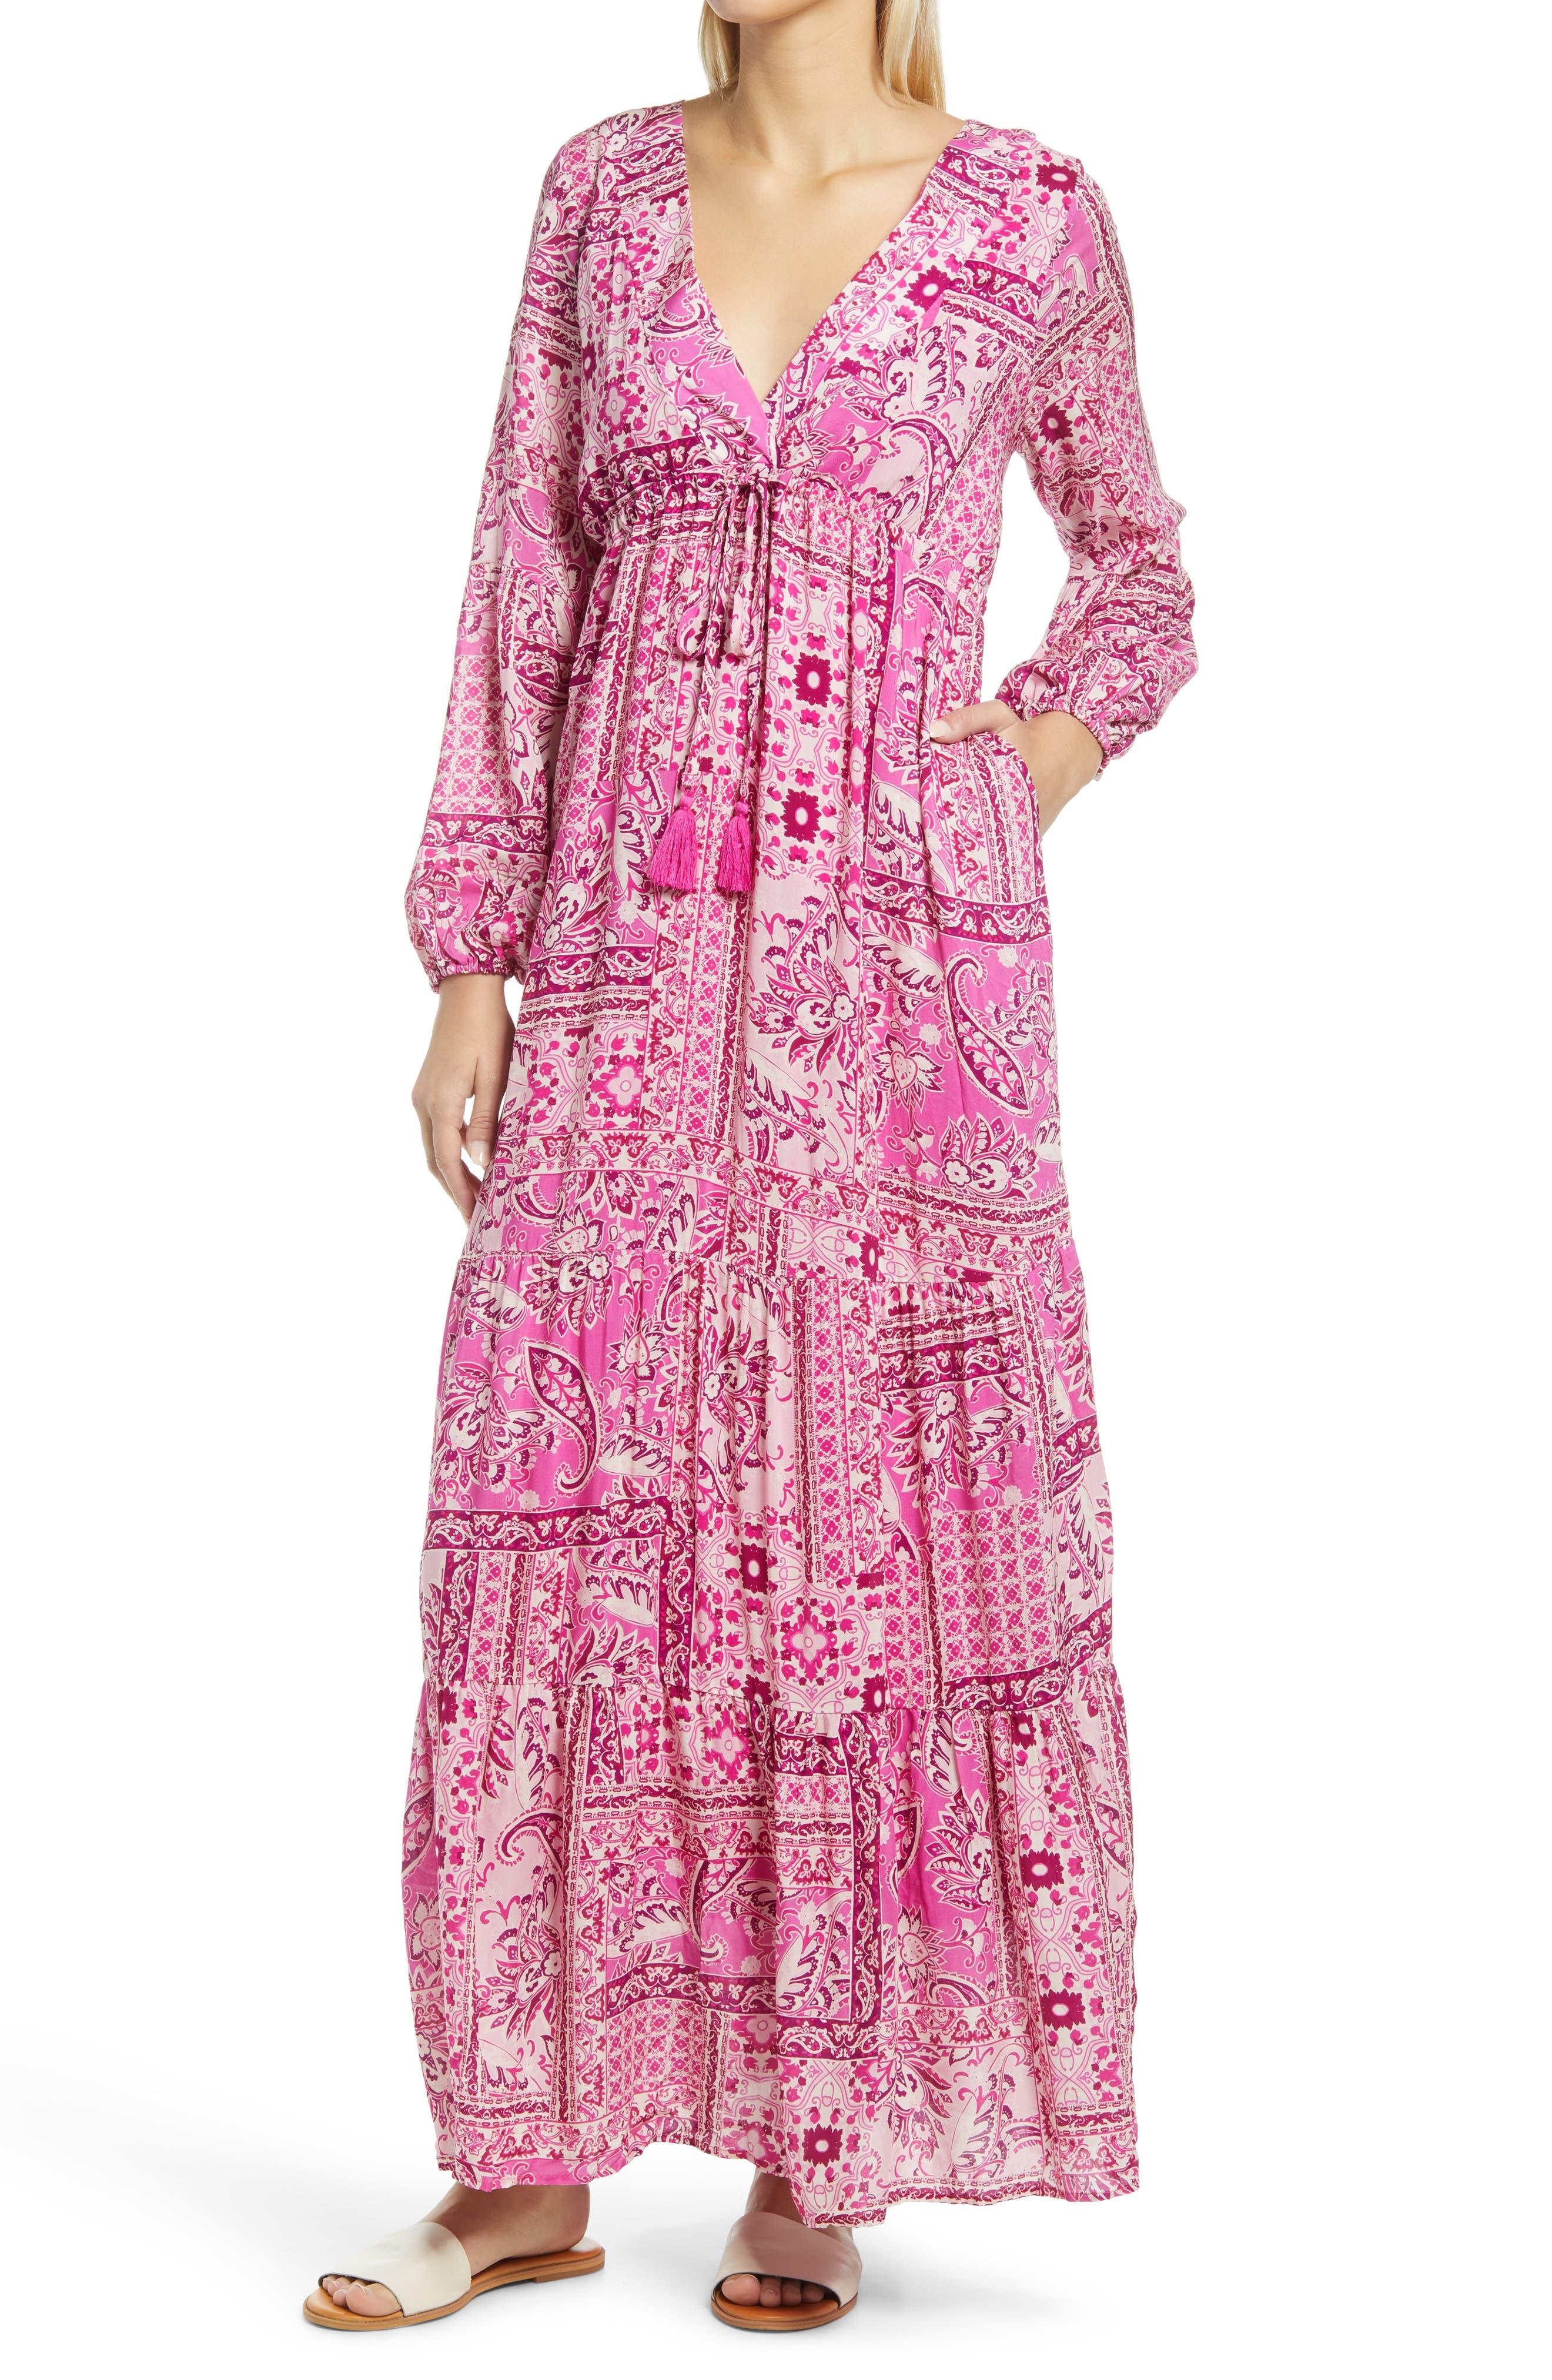 Boho Patchwork Long Sleeve Dress